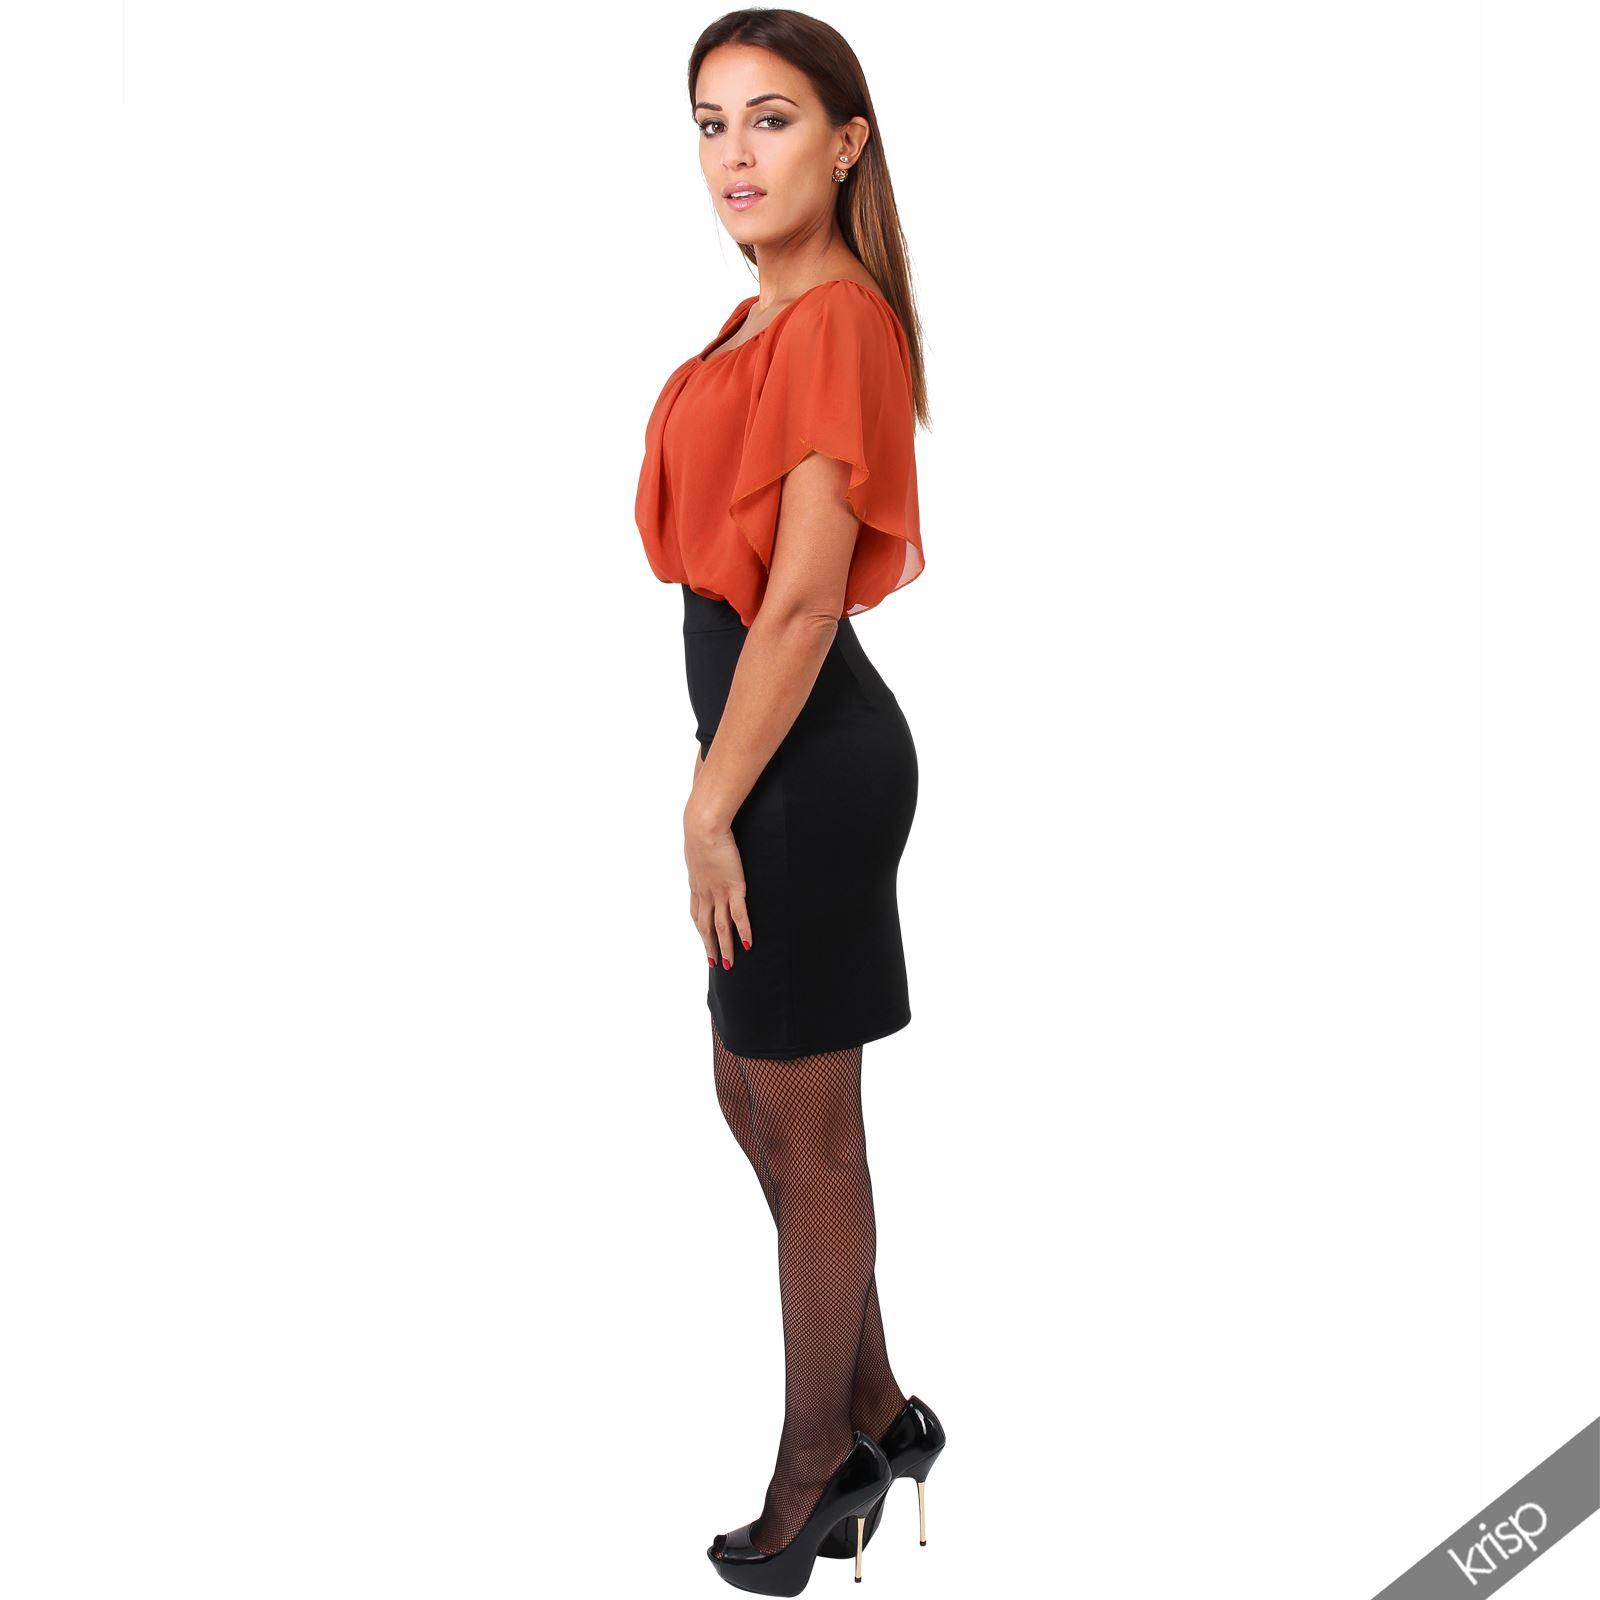 Womens-Pleated-Chiffon-Batwing-Top-High-Waist-Pencil-Bodycon-Skirt-Mini-Dress thumbnail 30